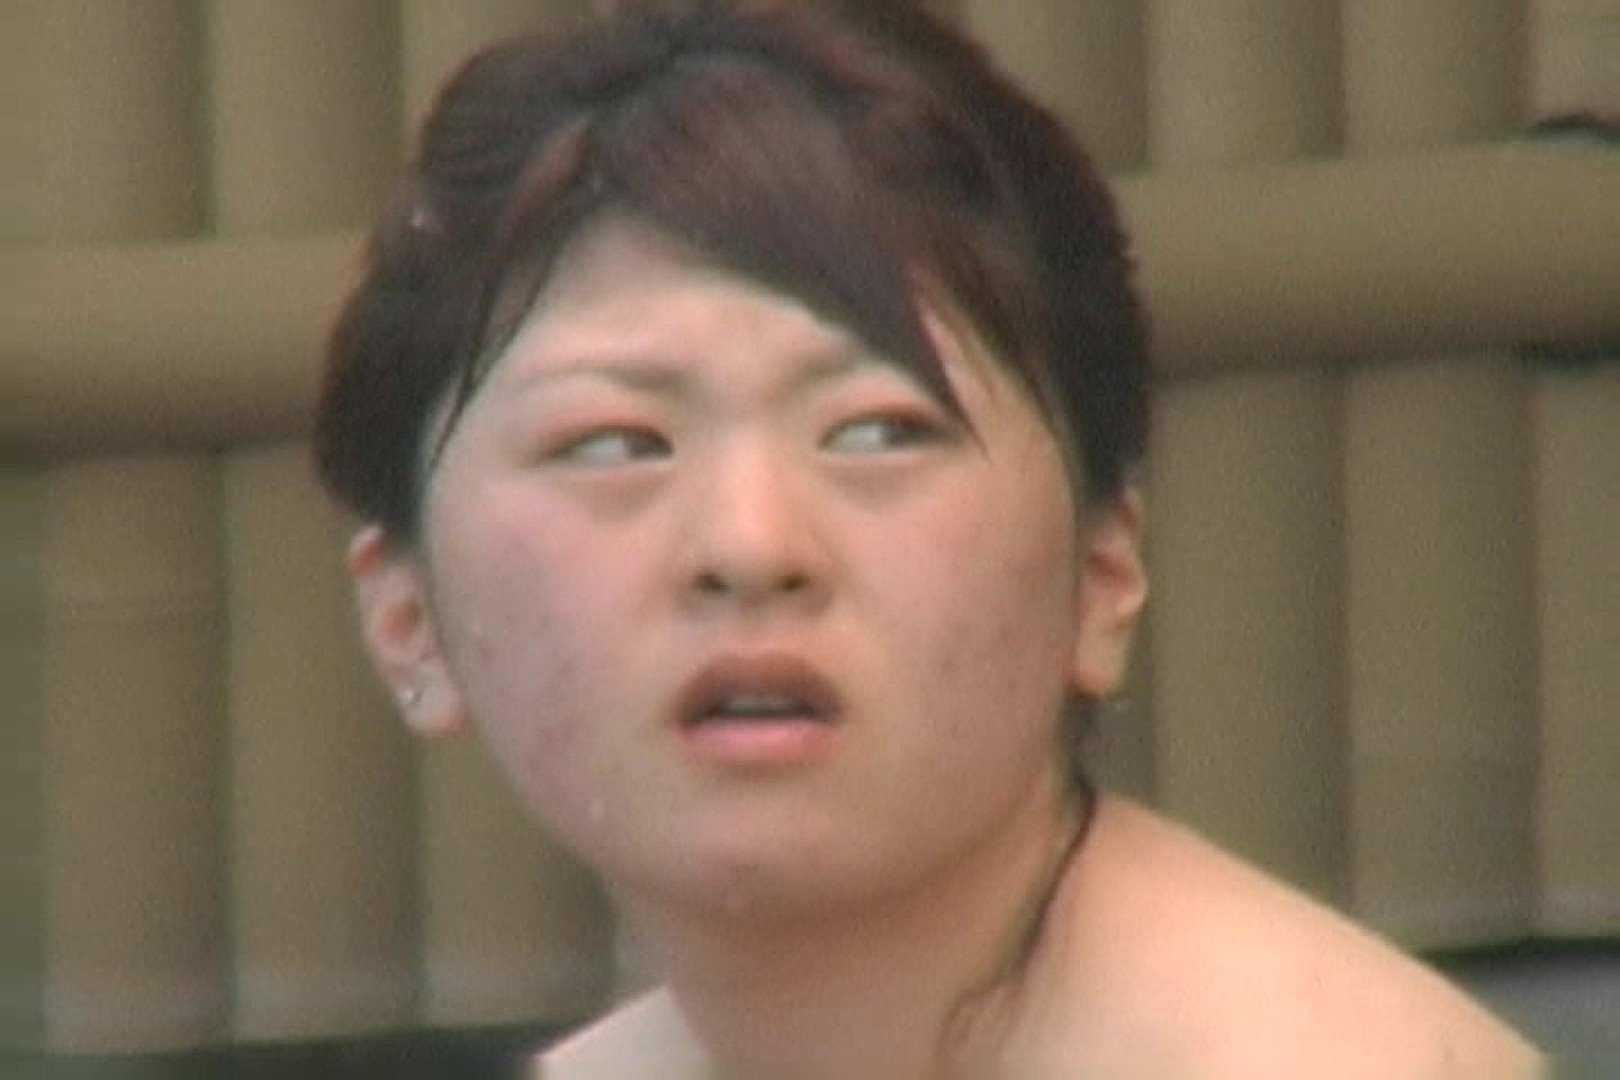 Aquaな露天風呂Vol.115 盗撮師作品 アダルト動画キャプチャ 91pic 20